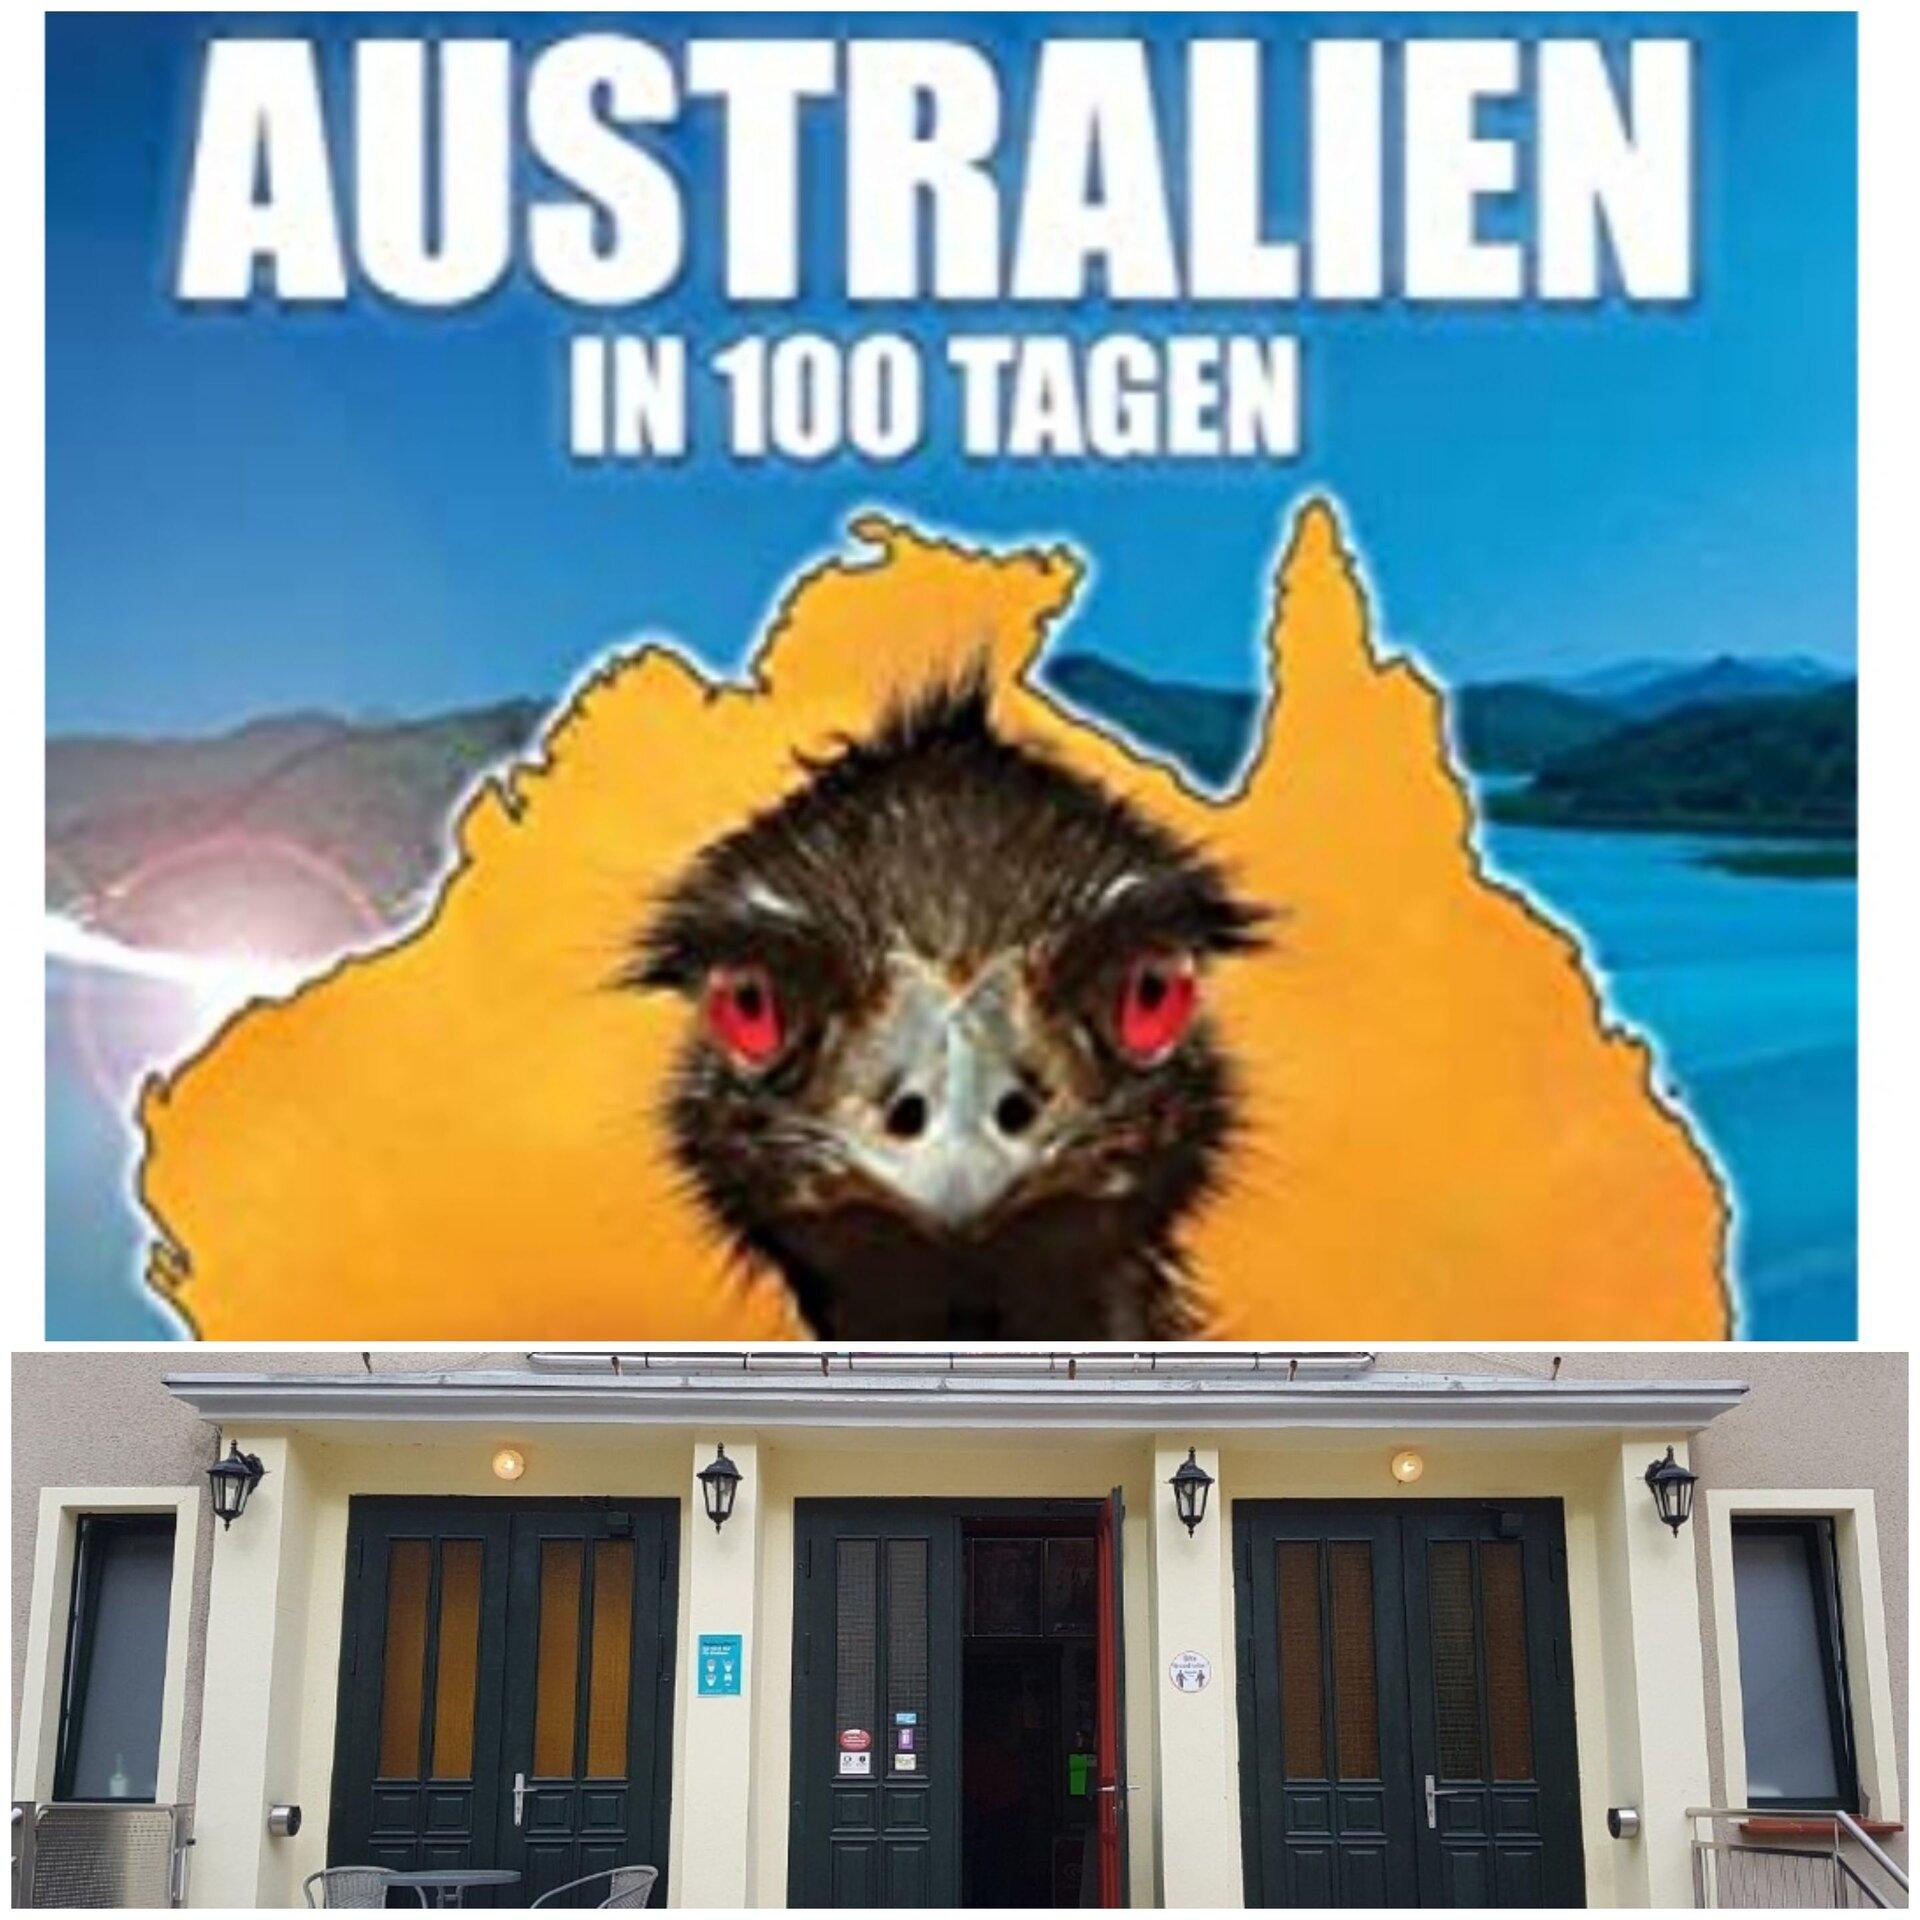 Projekt Australien Kl.9